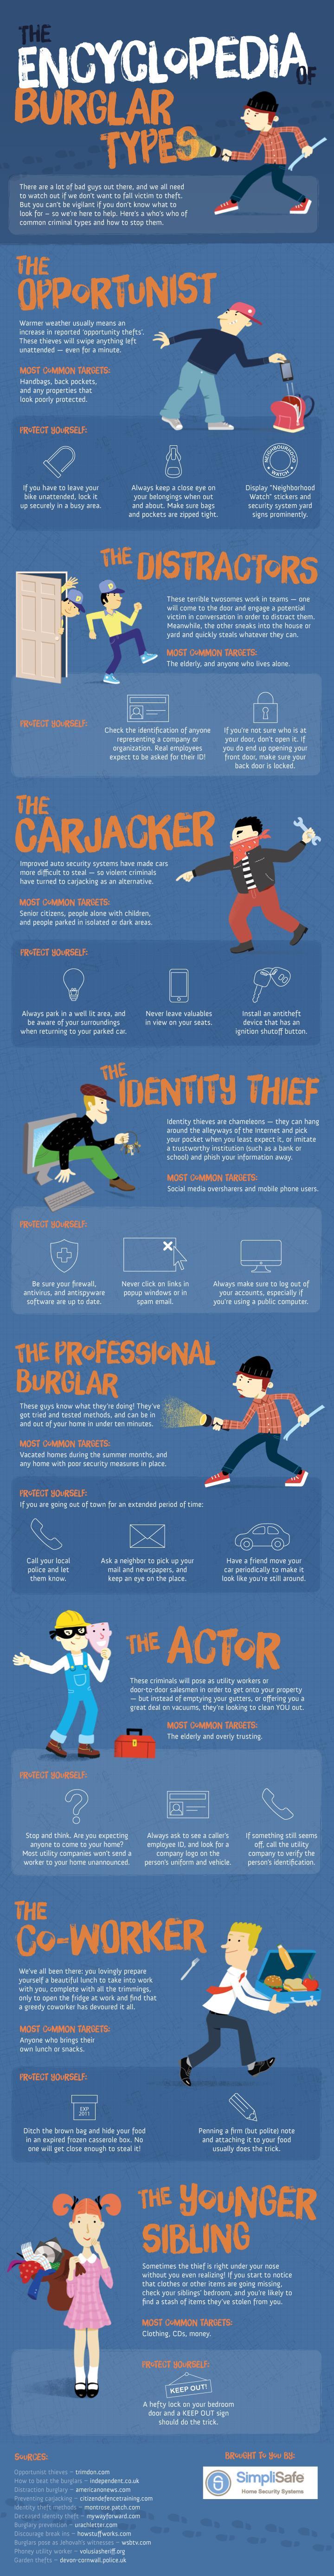 encyclopedia-of-burglar-types